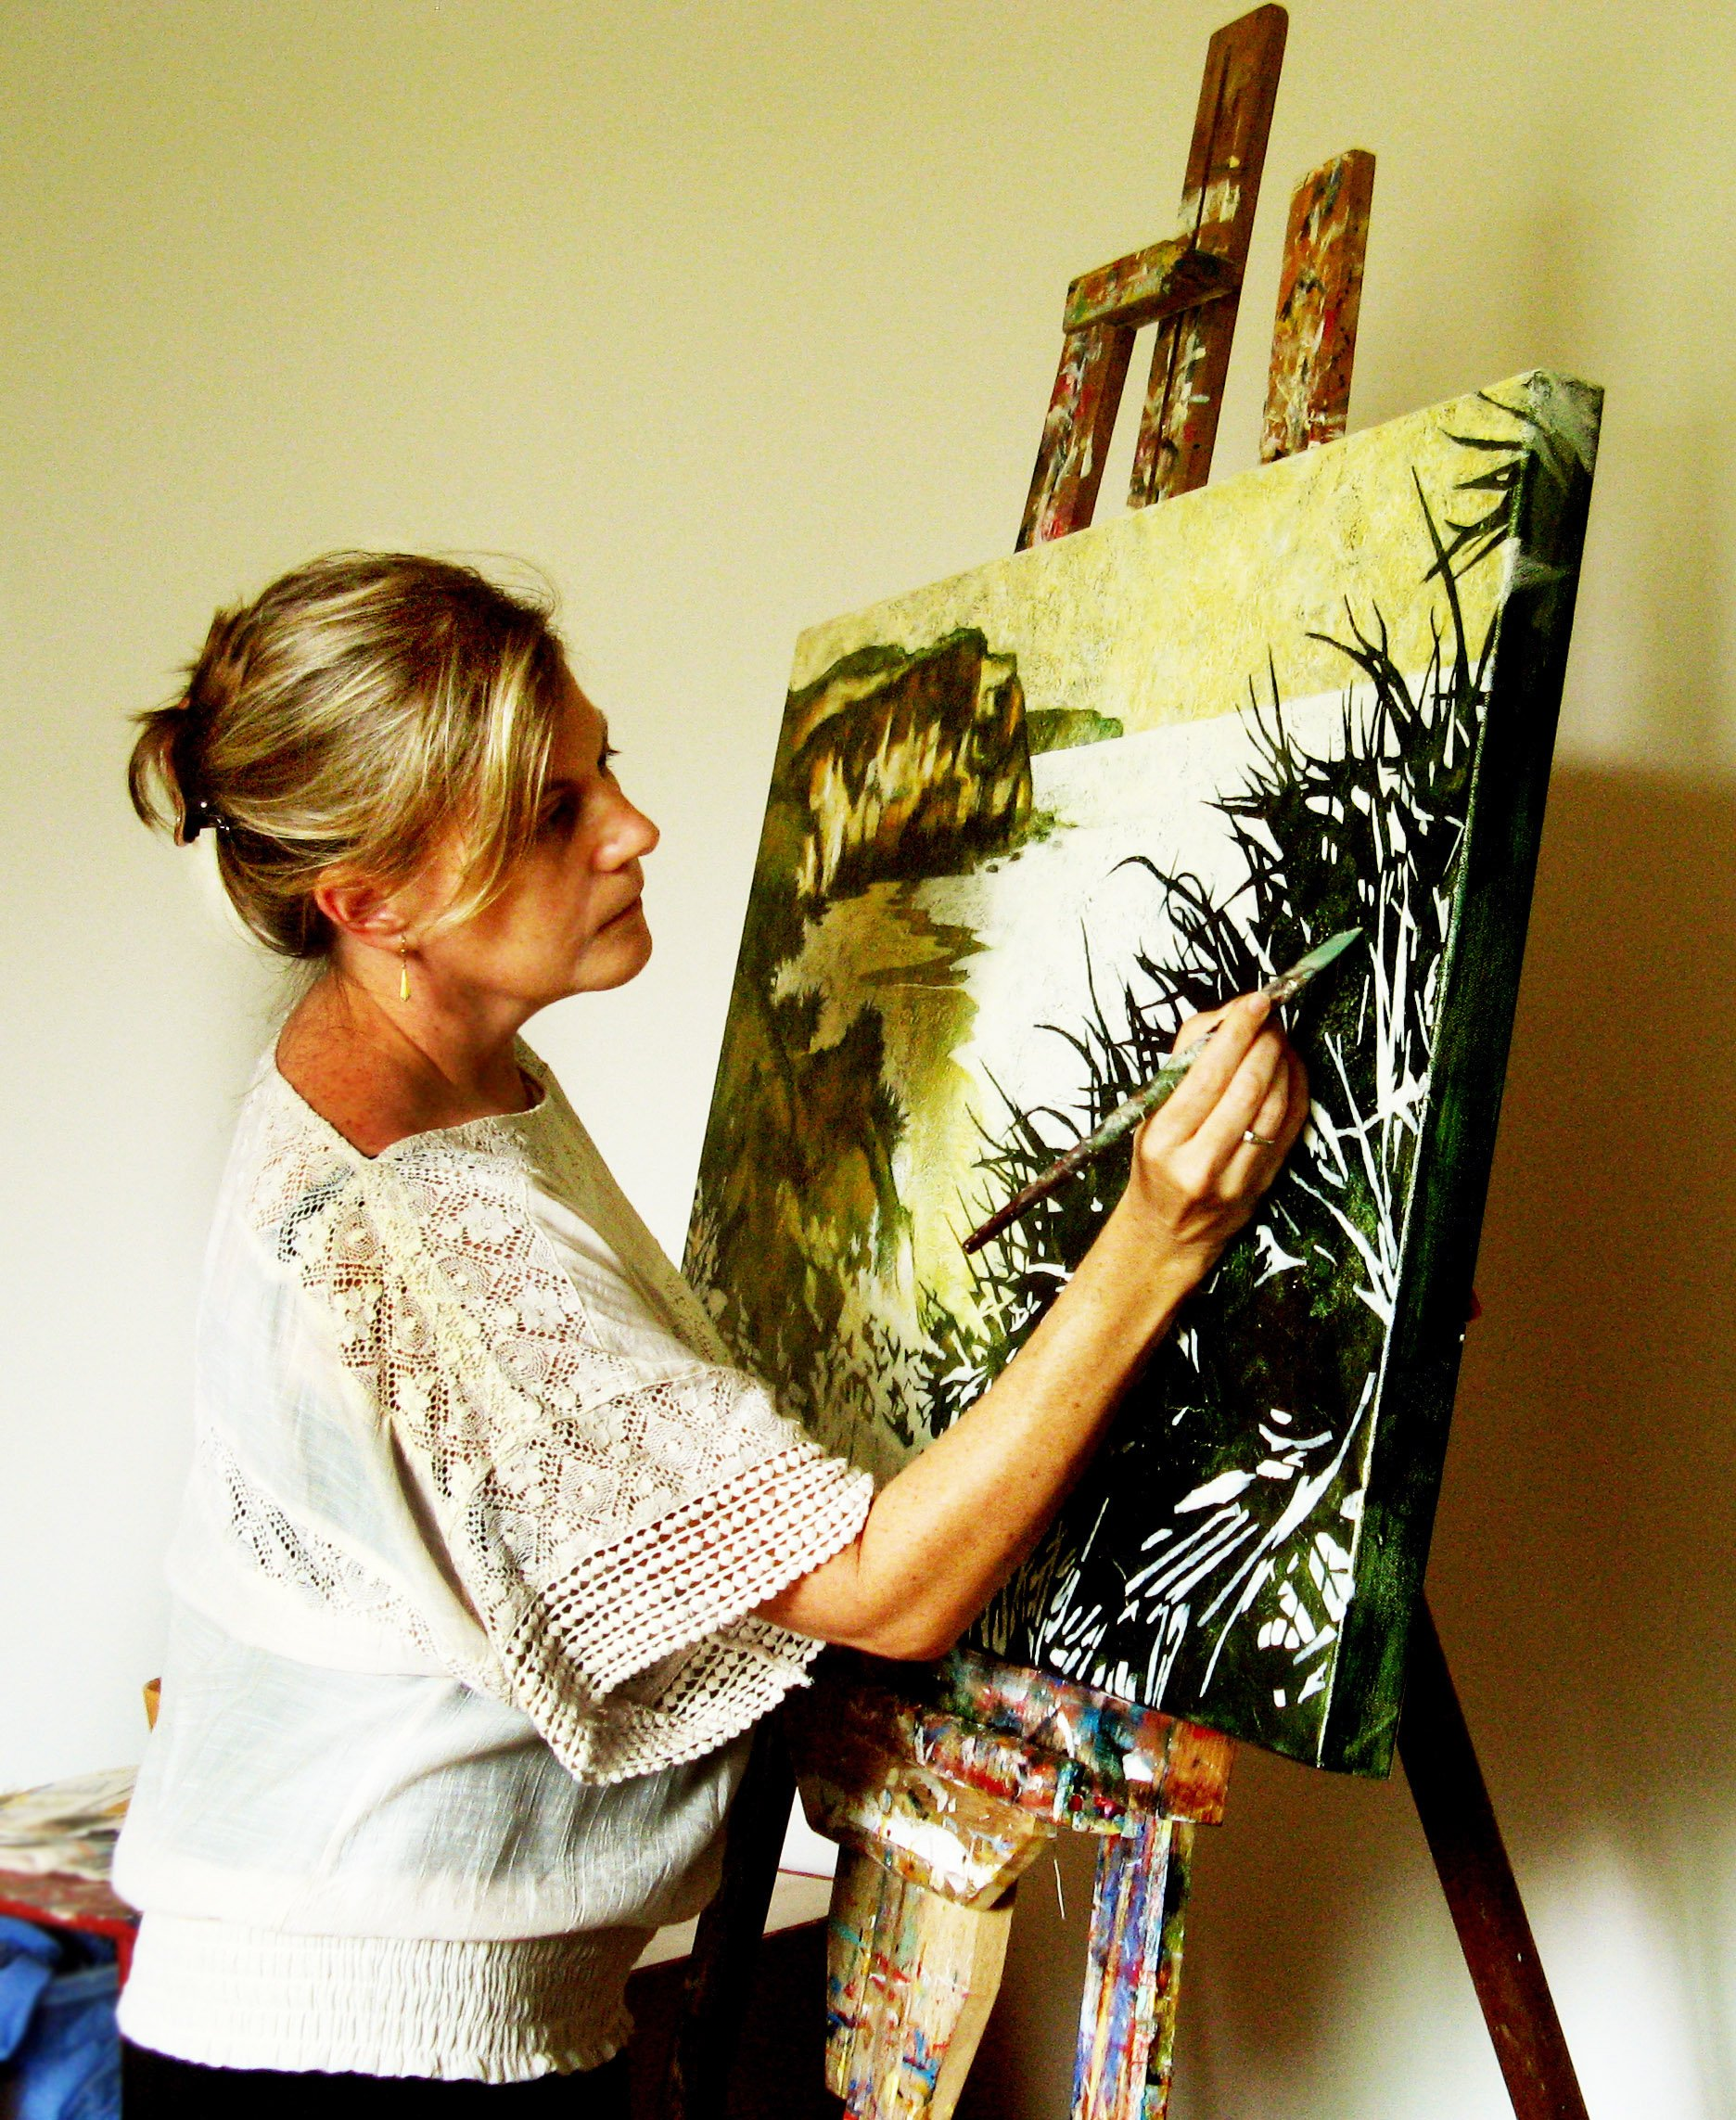 Artist Karyn Fendley painting a landscape on canvas